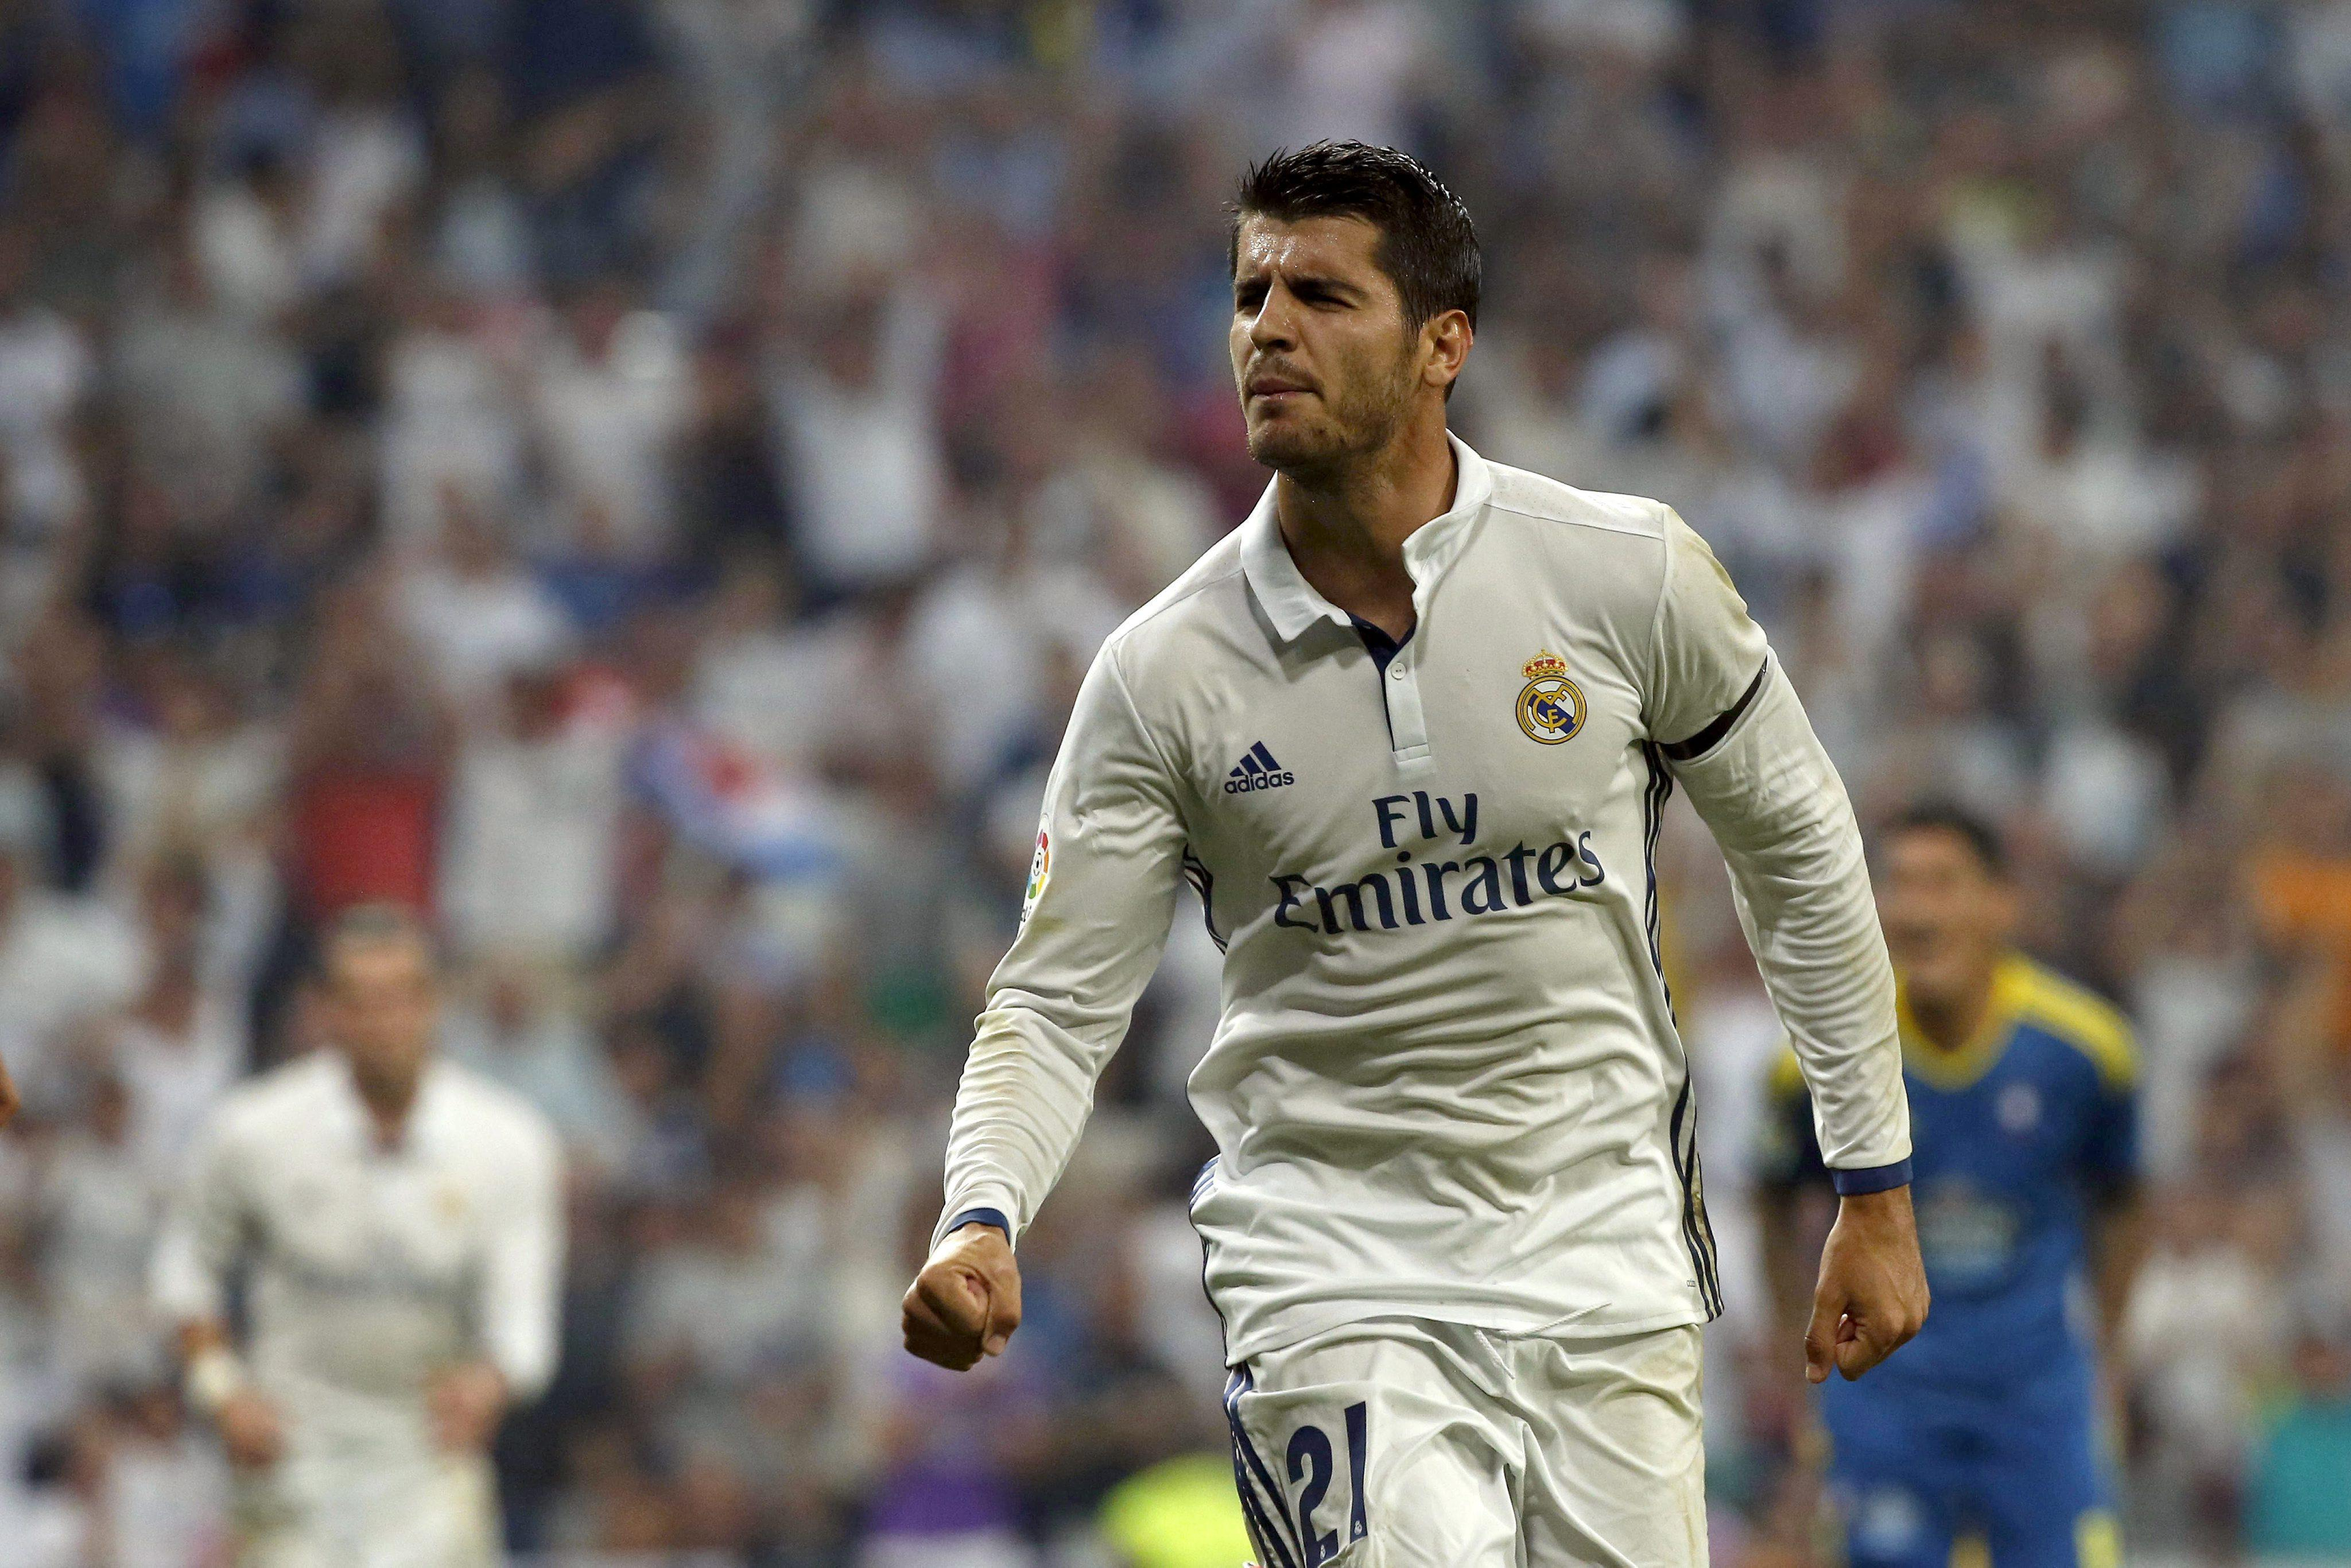 Alvaro Morata insists Real Madrid treated him like a child when he returned